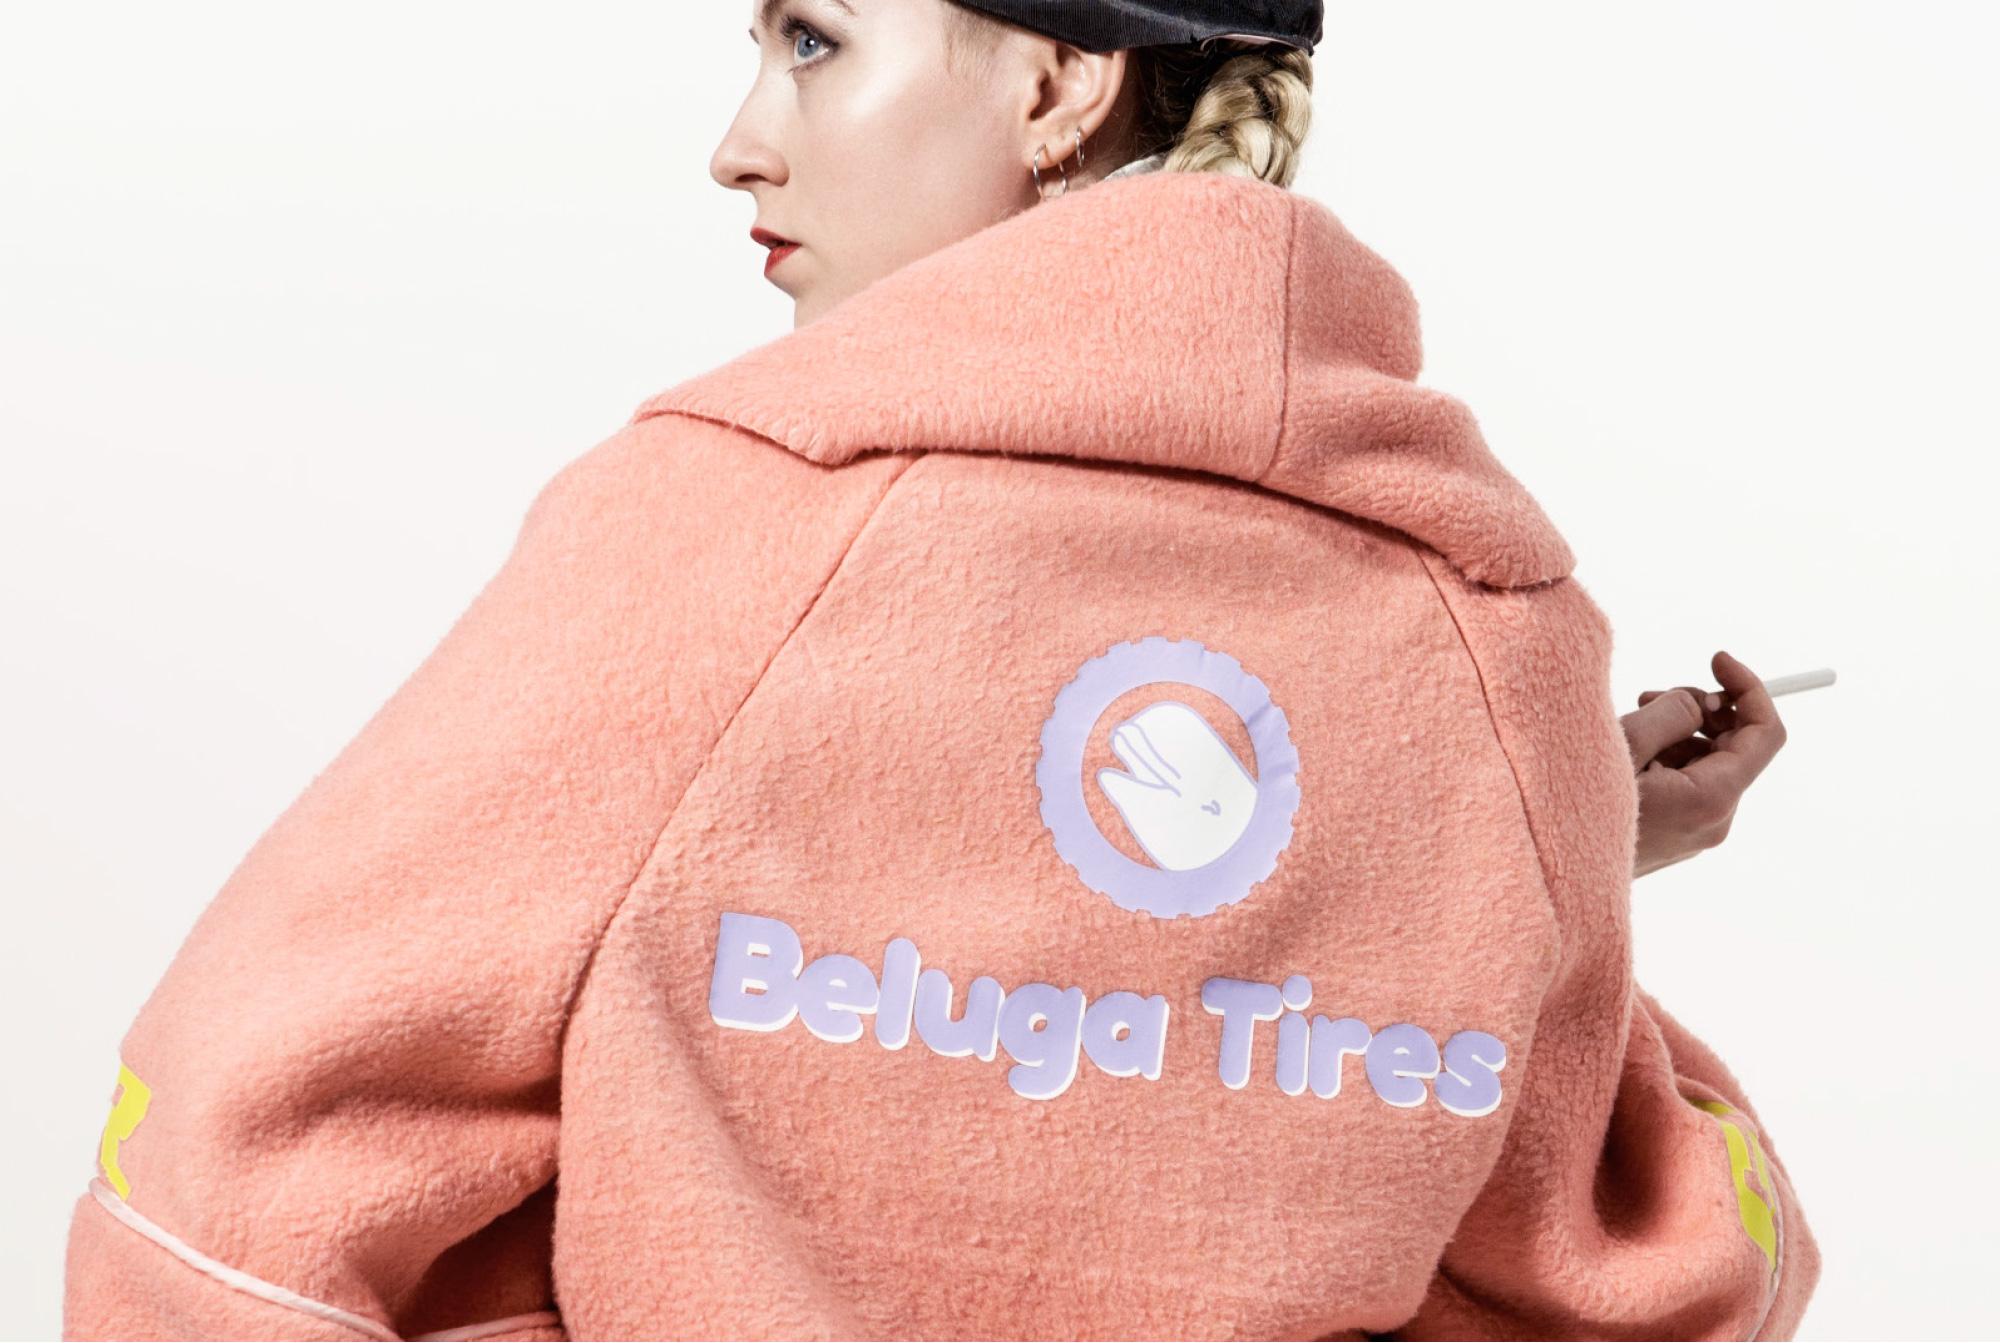 Blanket coat rear-view with Beluga Tires logo (vinyl transfer)